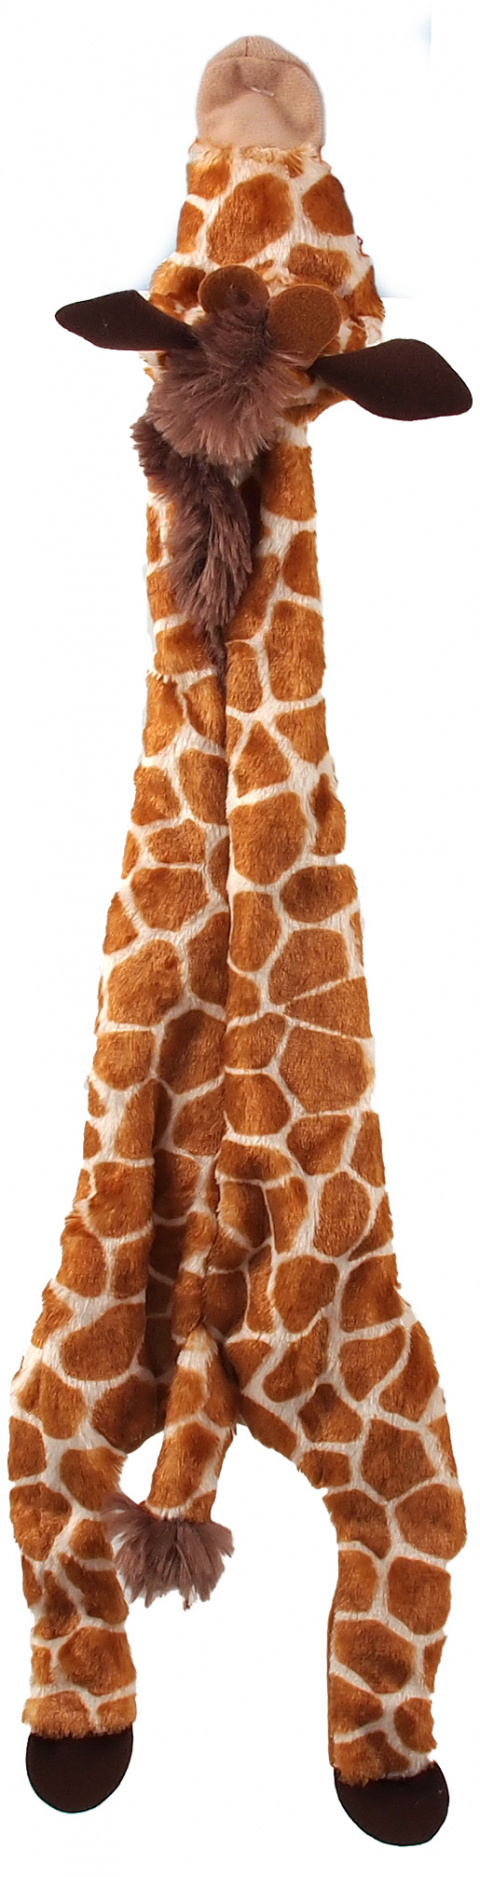 Hračka Dog Fantasy Skinneeez žirafa 50cm title=